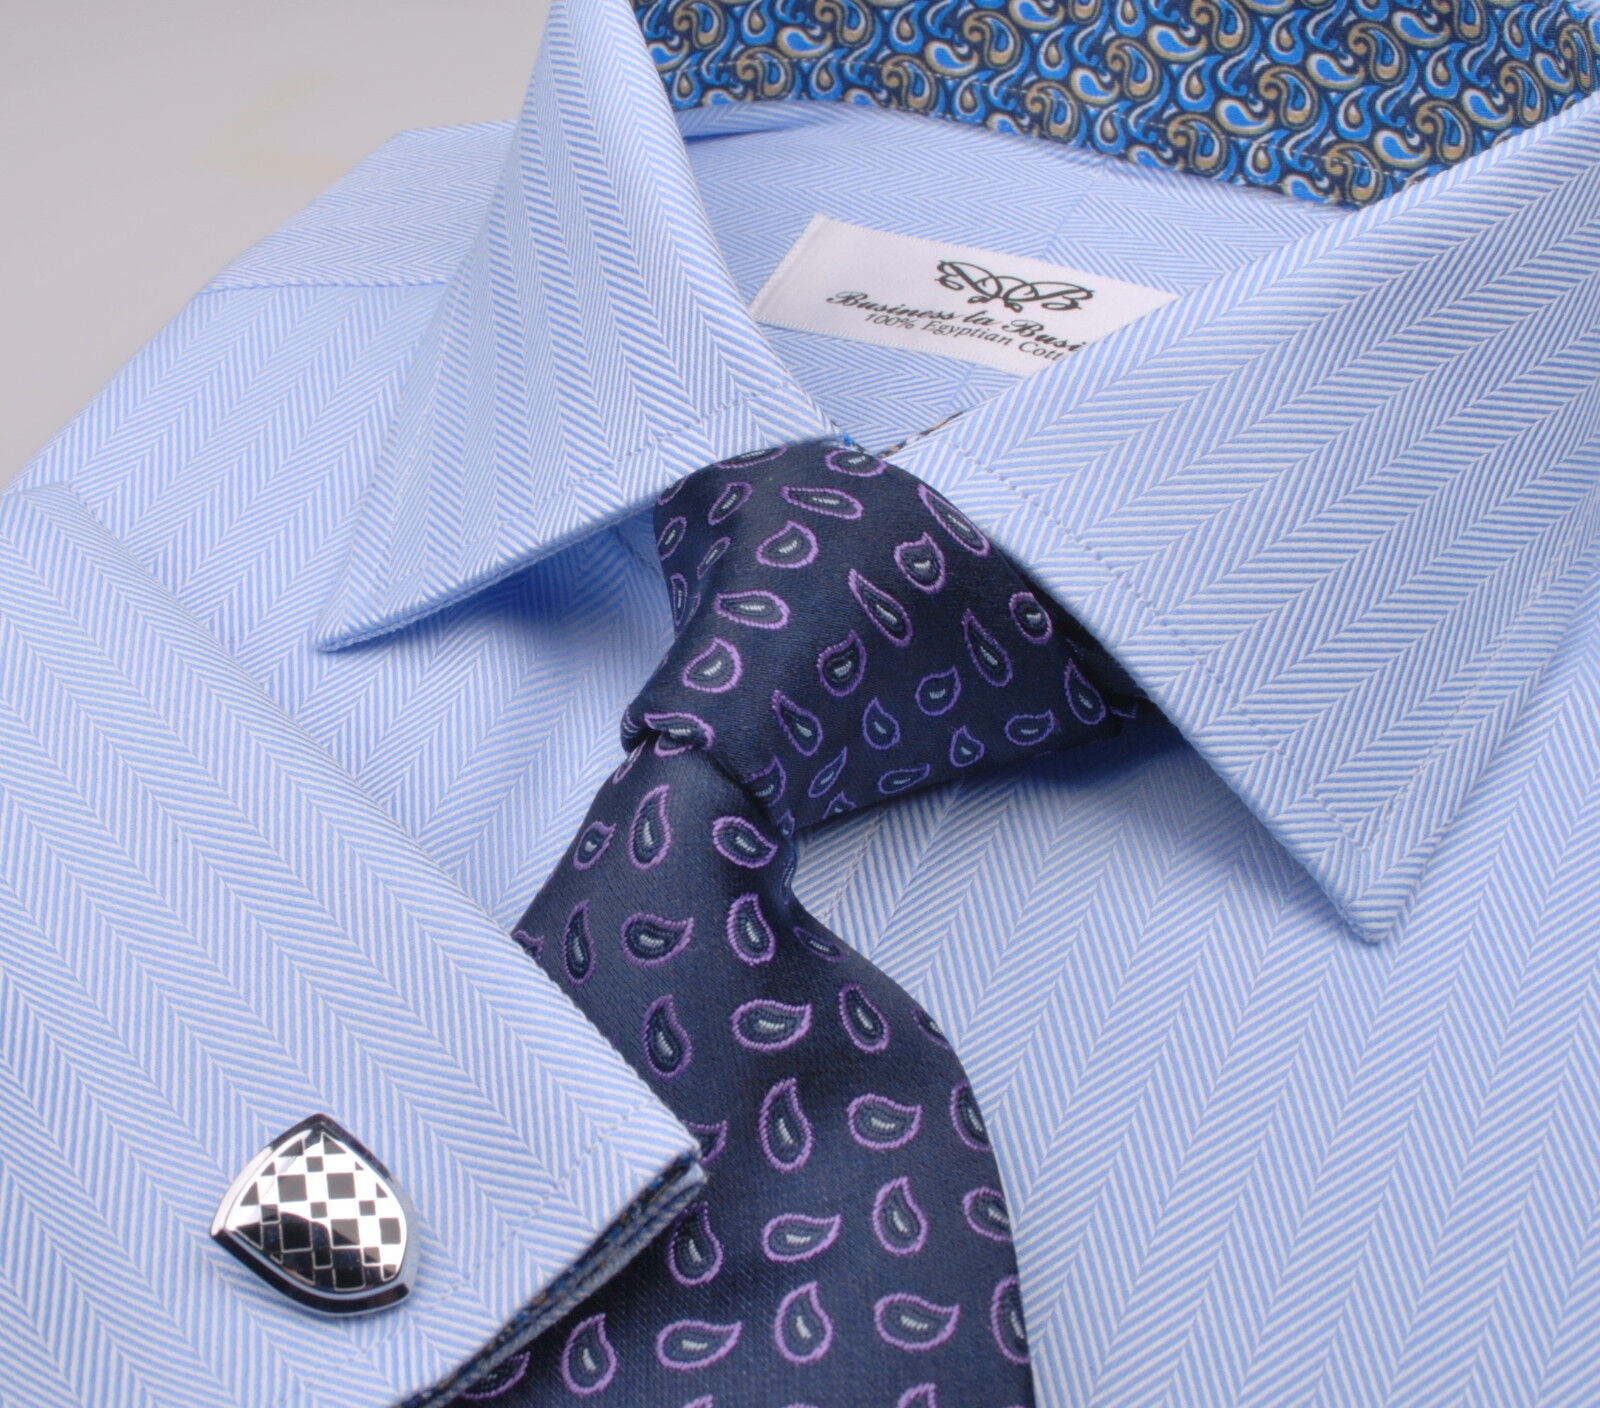 Solid bluee Herringbone Dress Shirt Twill Business Formal Luxury Baroque Paisleys